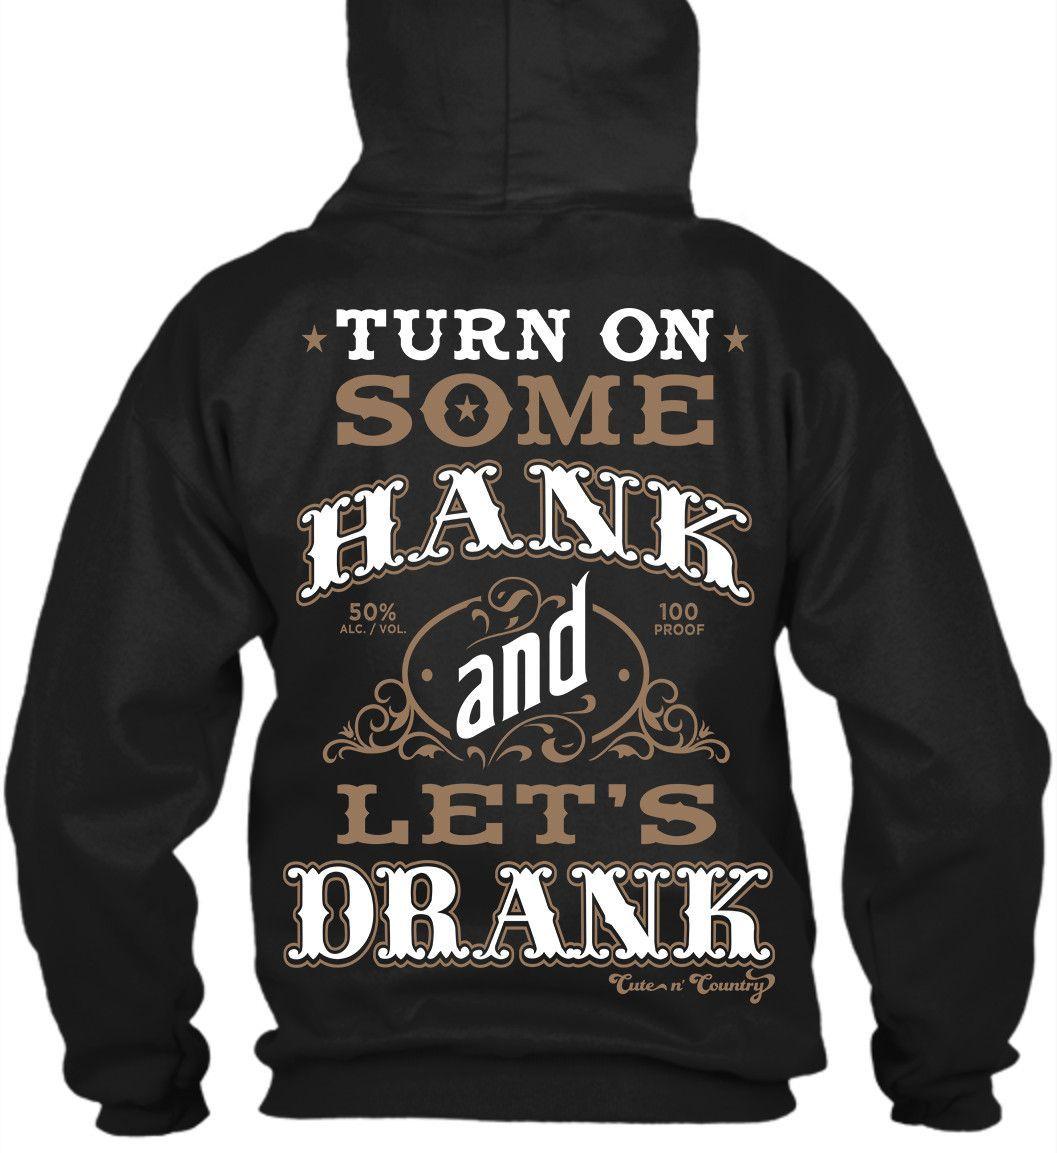 397c71429 Hoodie: Turn On Some Hank and Let's Drank Small / Black, Hoodies - Cute n'  Country, Cute n' Country - 1